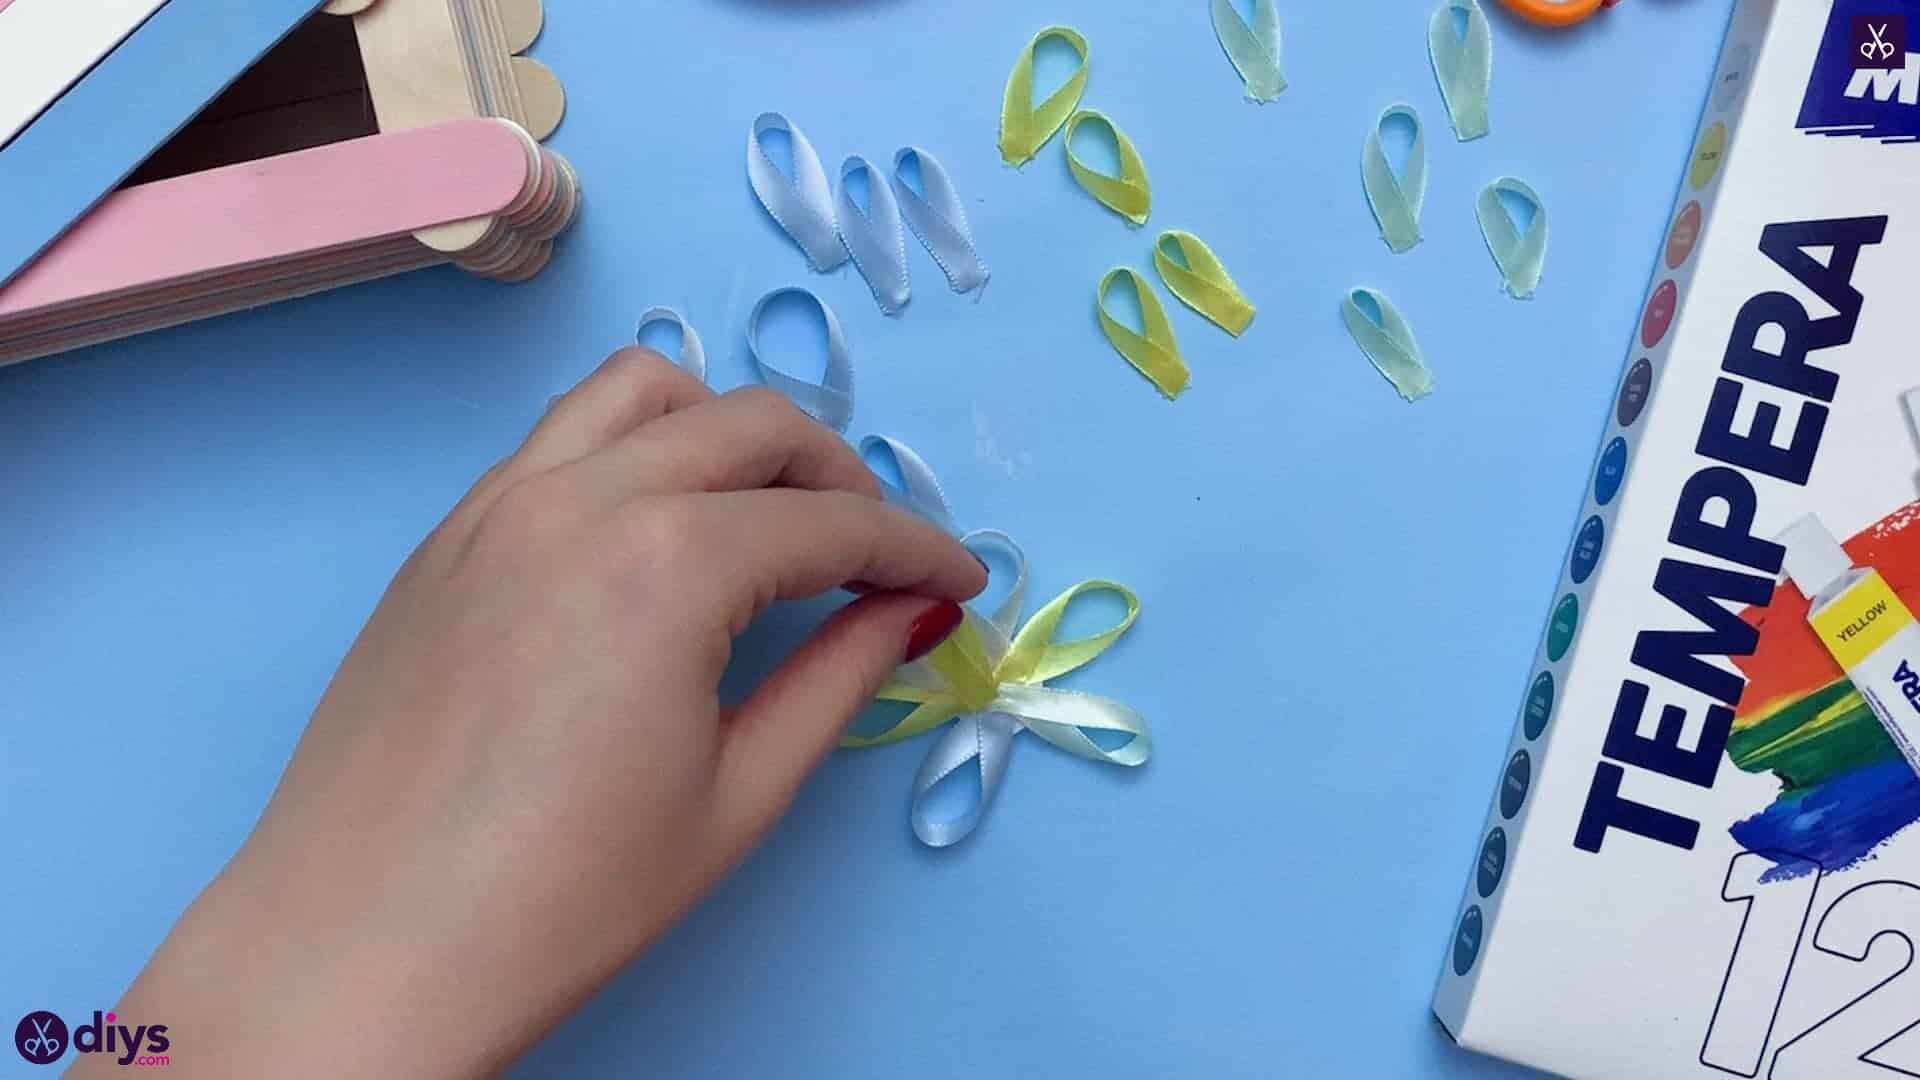 Diy popsicle stick jewelry box step 10